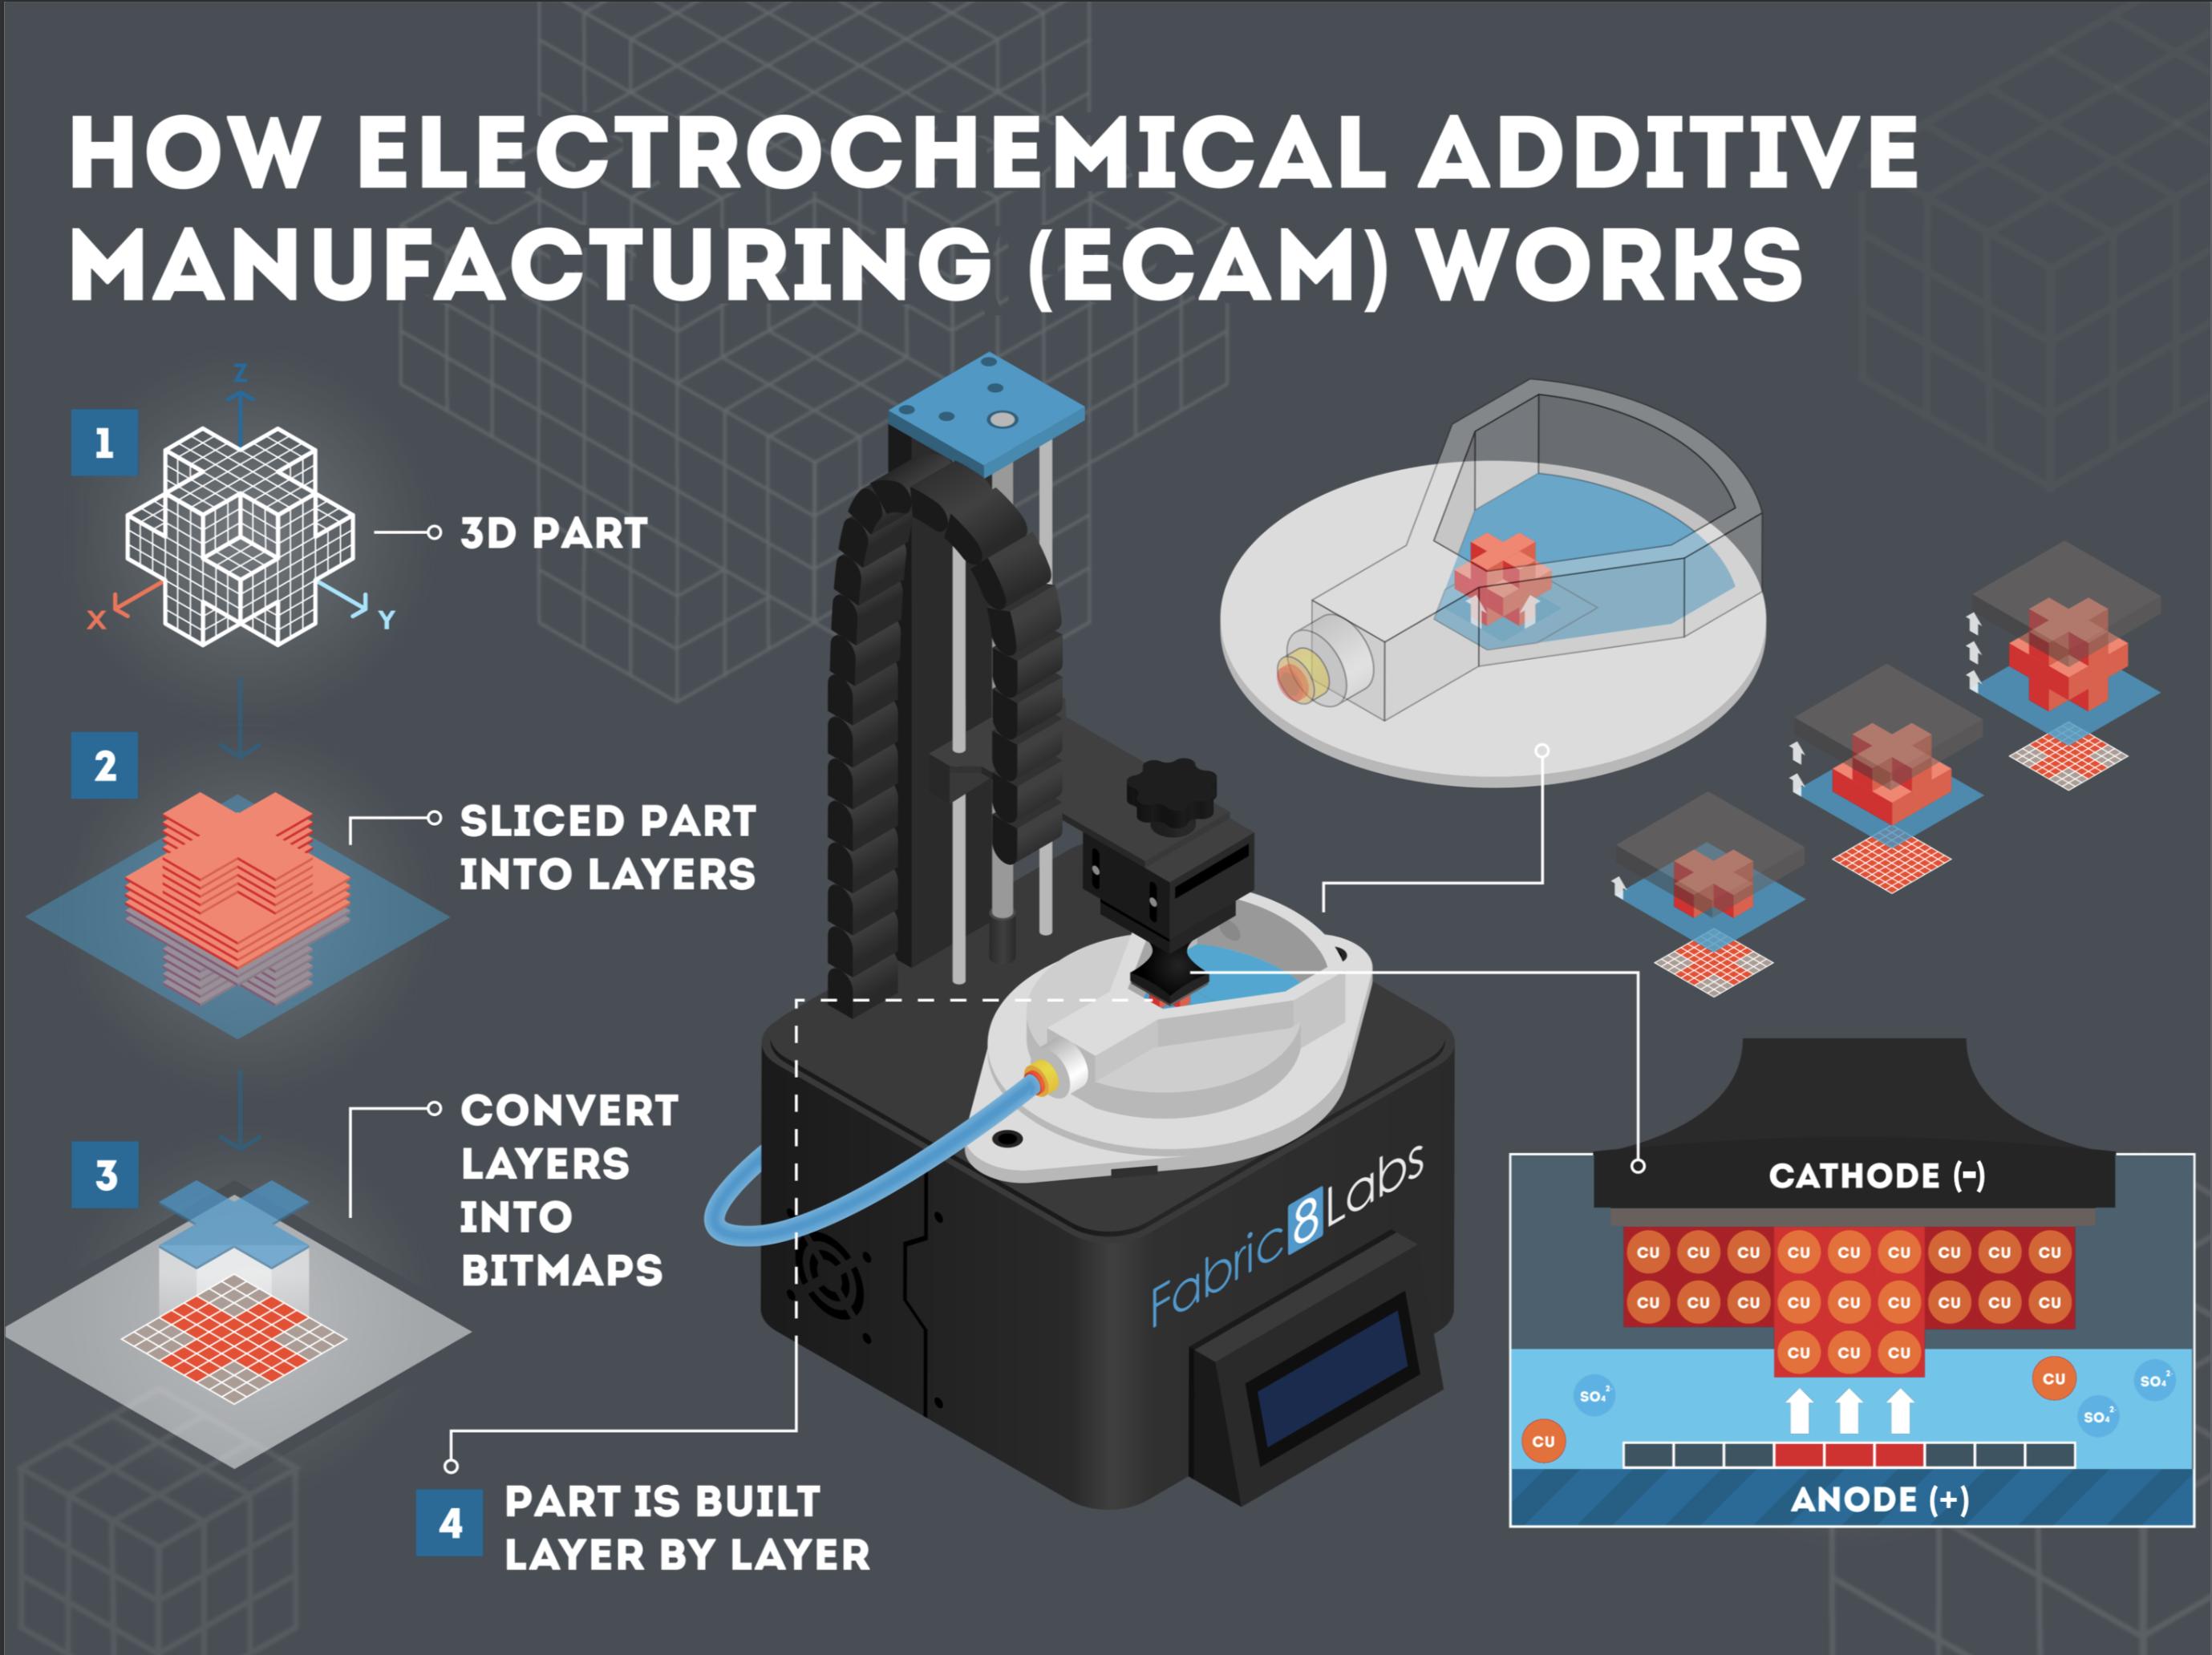 The ECAM process.